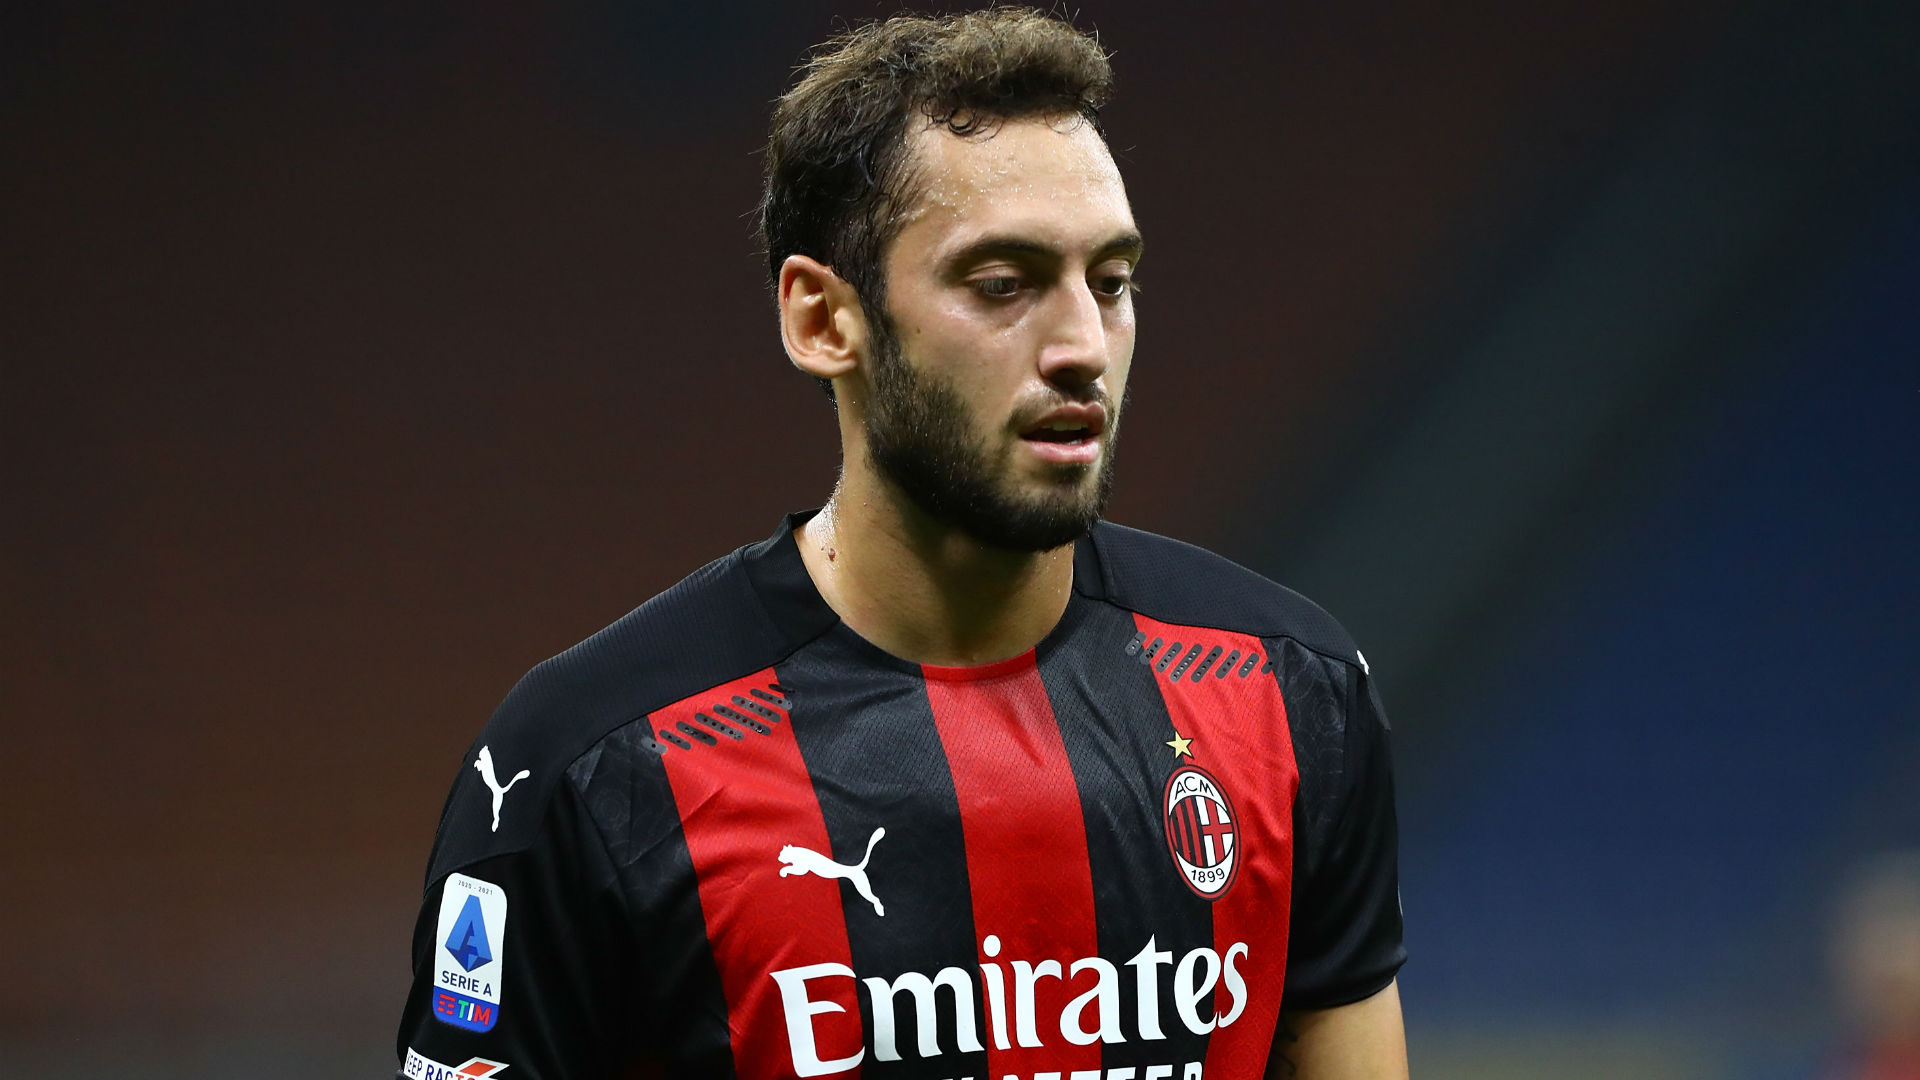 transfer news and rumours live man utd plot calhanoglu move goal com transfer news and rumours live man utd